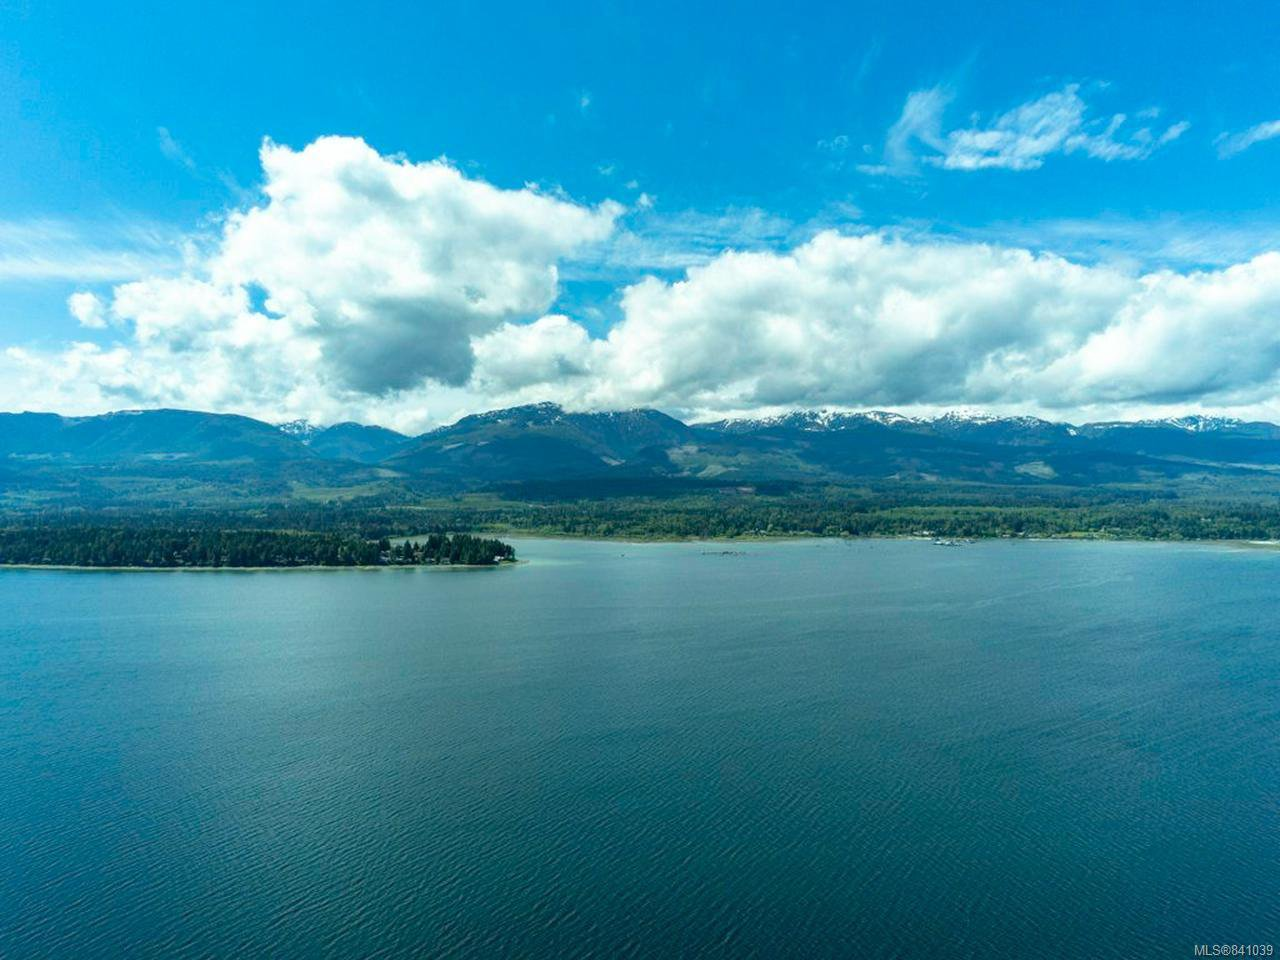 Main Photo: LT 7 Glen Ghorm Rd in DENMAN ISLAND: Isl Denman Island Land for sale (Islands)  : MLS®# 841039